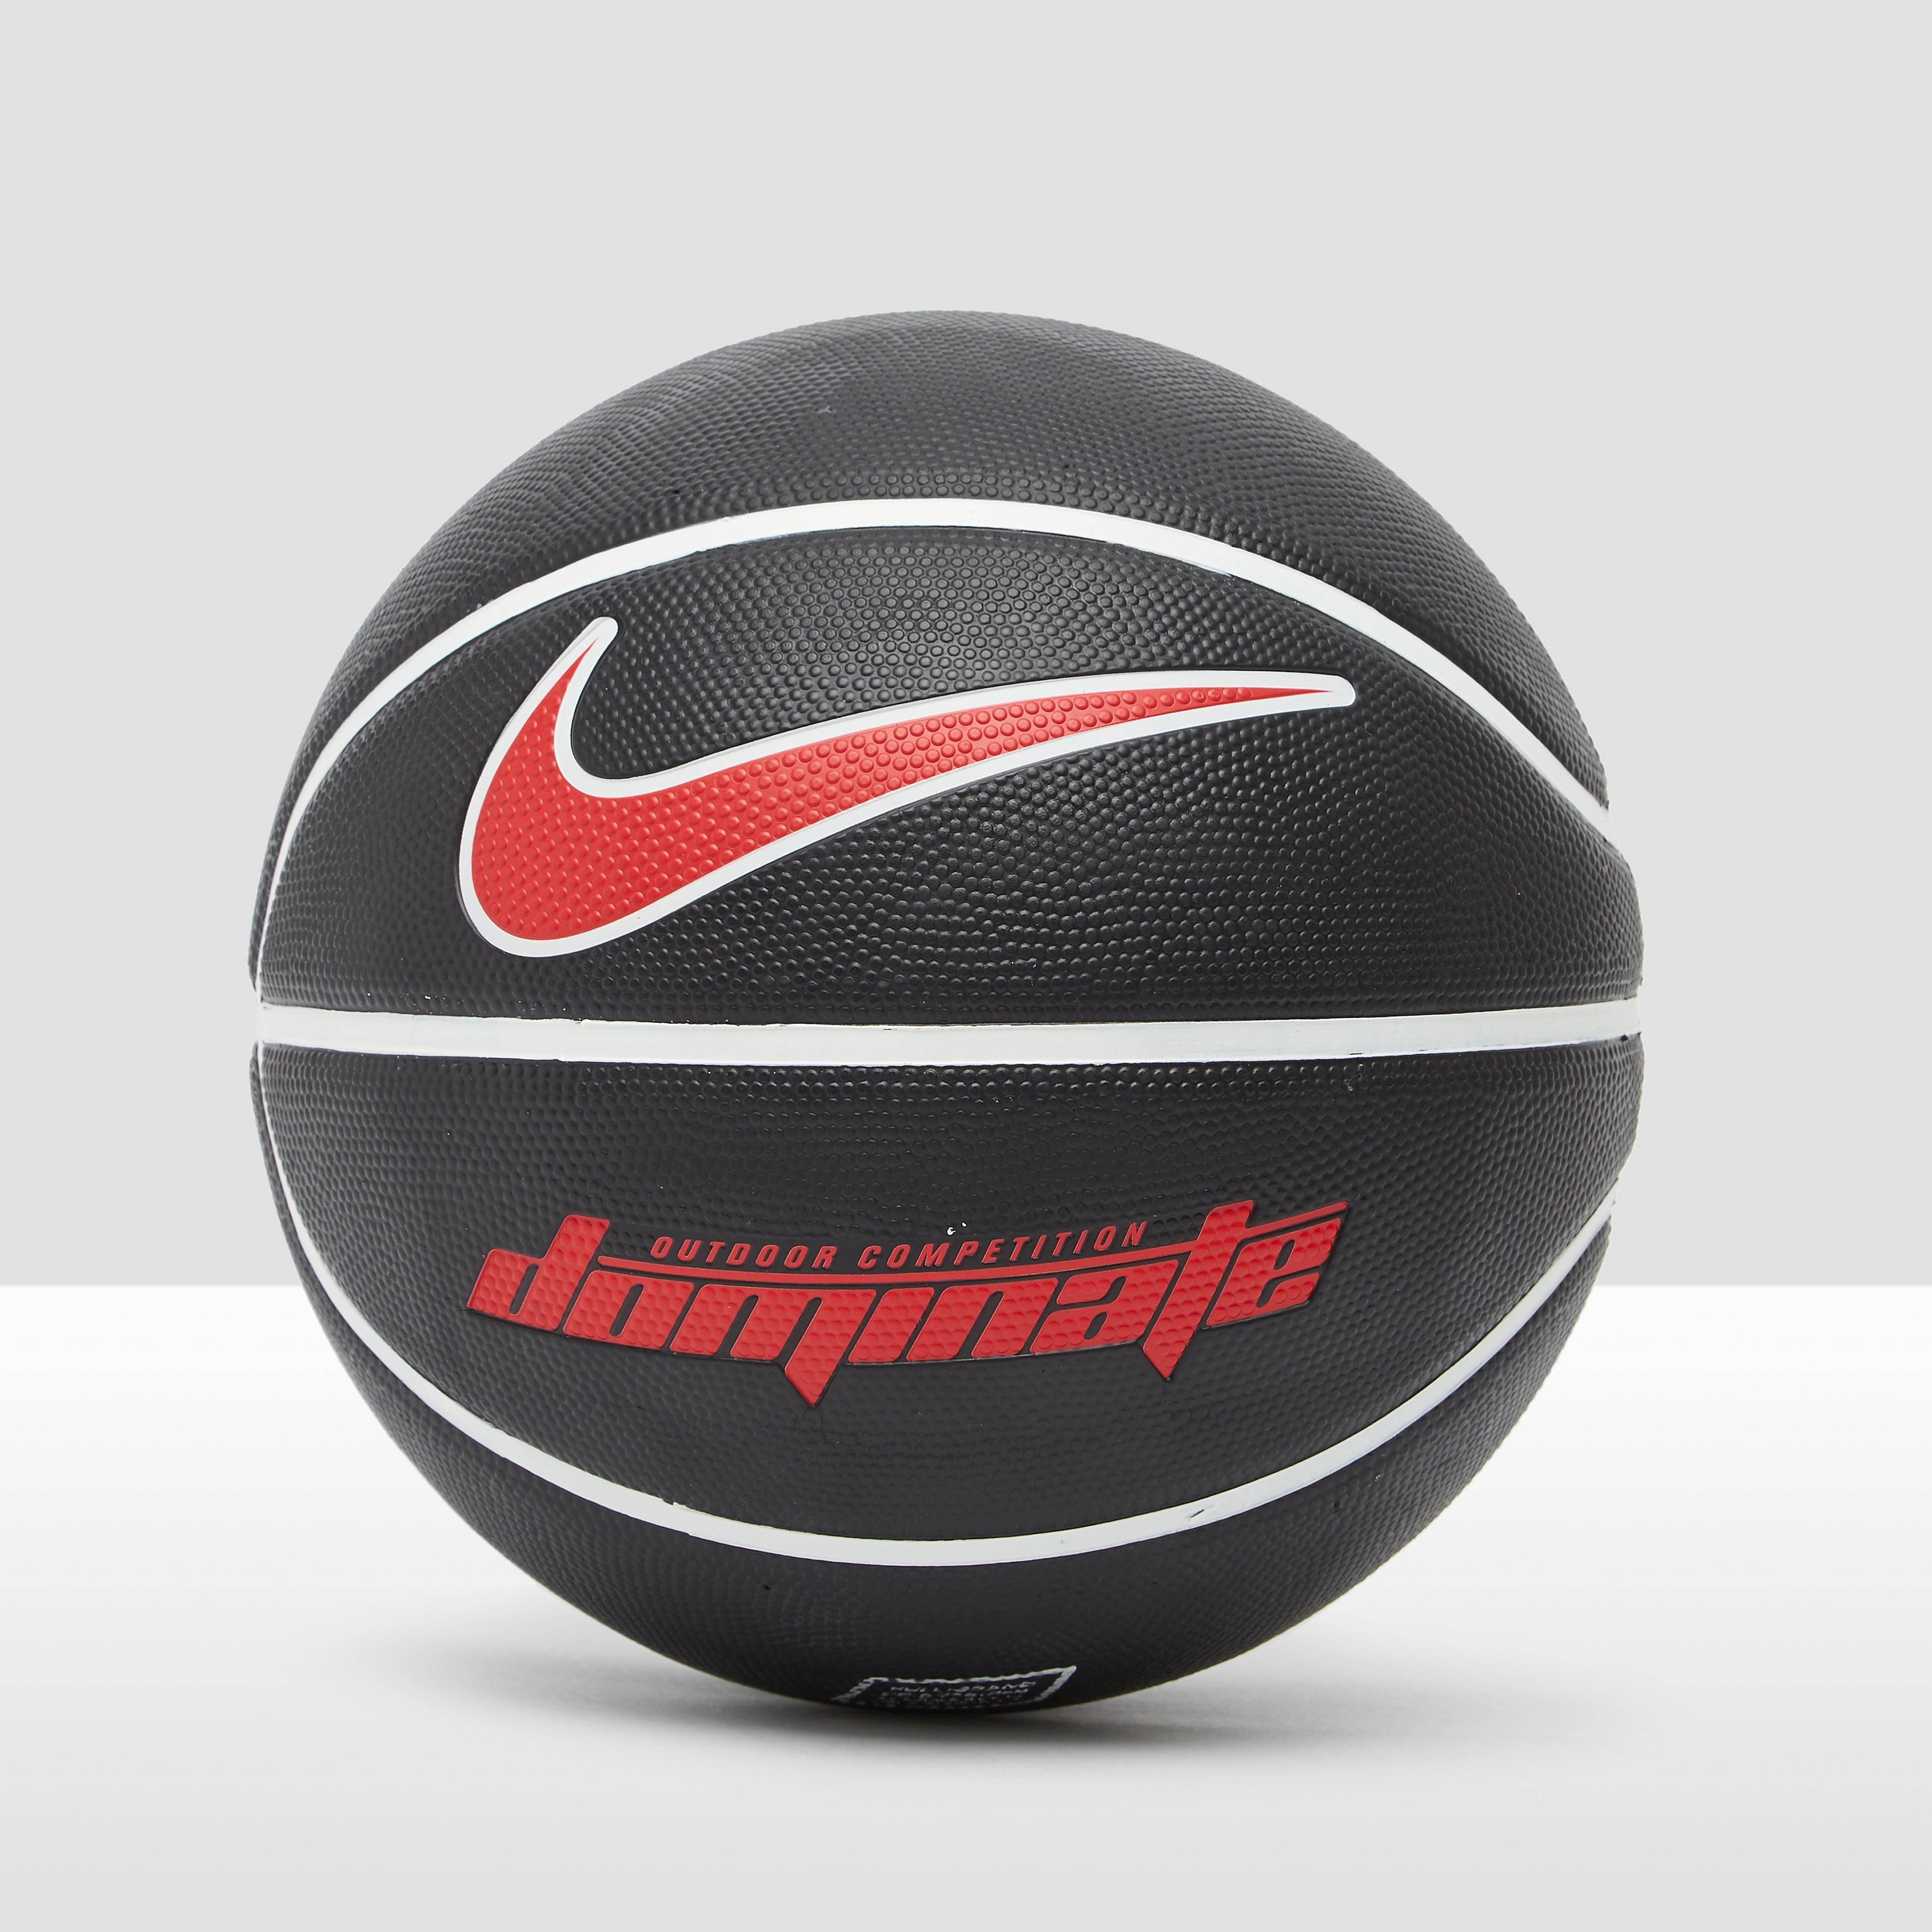 NIKE Dominate 8-panel basketbal zwart/rood Kinderen